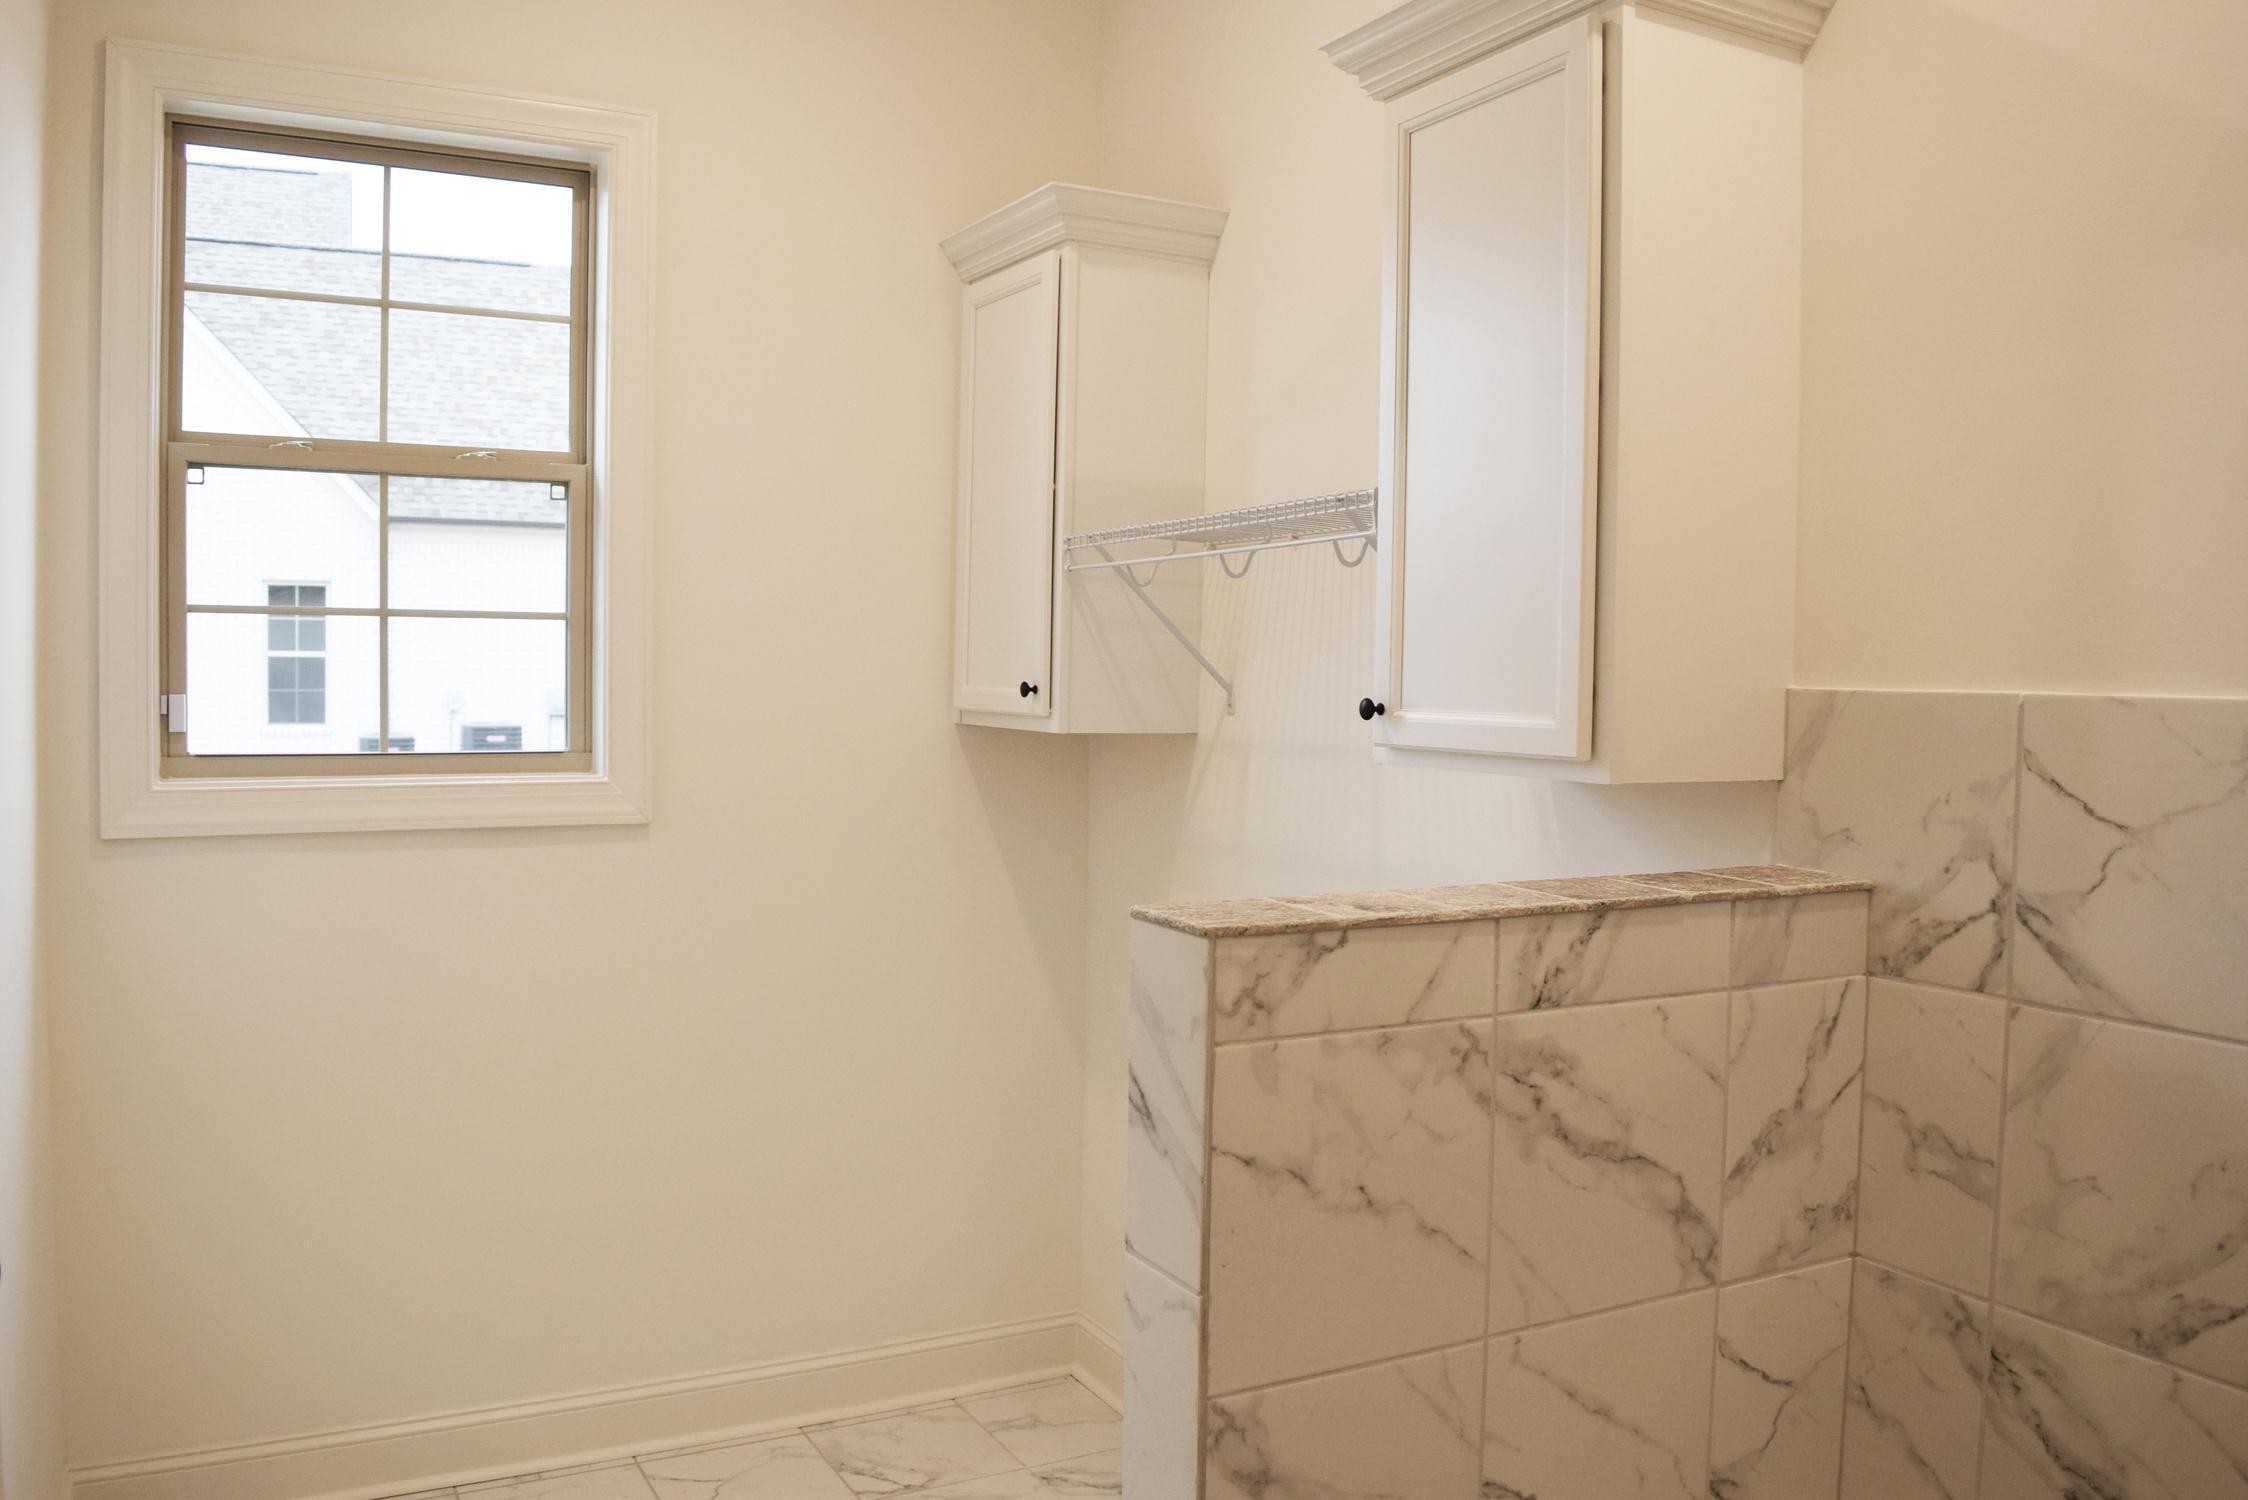 Living Area featured in the Woodrow By Regency Homebuilders in Memphis, TN